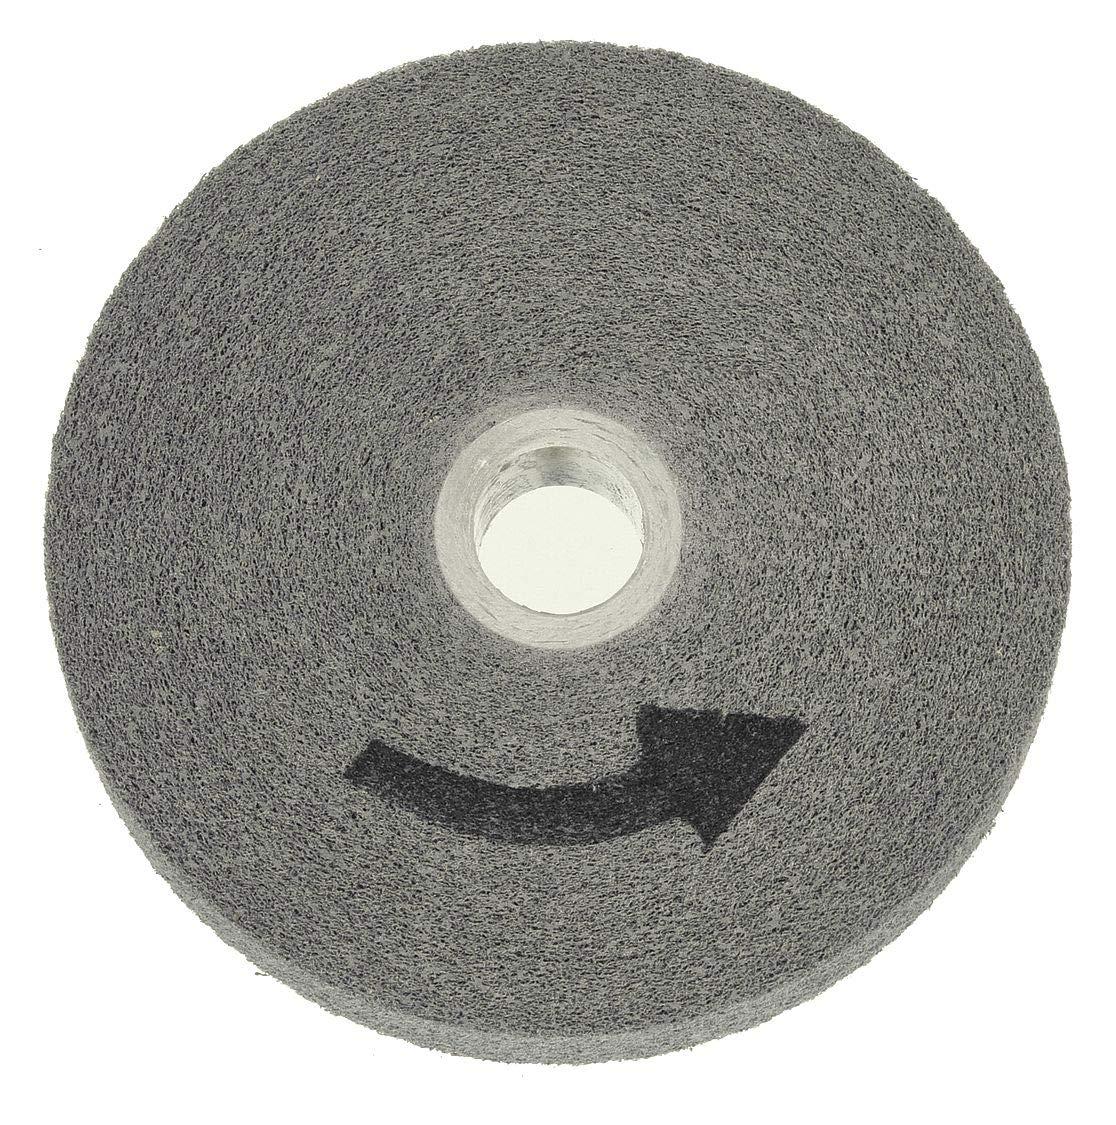 Saint-gobain Abrasives 6'' Metal Finishing Convolute Wheel, 1/2'' W, 1'' Arbor Hole, Fine Silicon Carbide by Norton Abrasives - St. Gobain